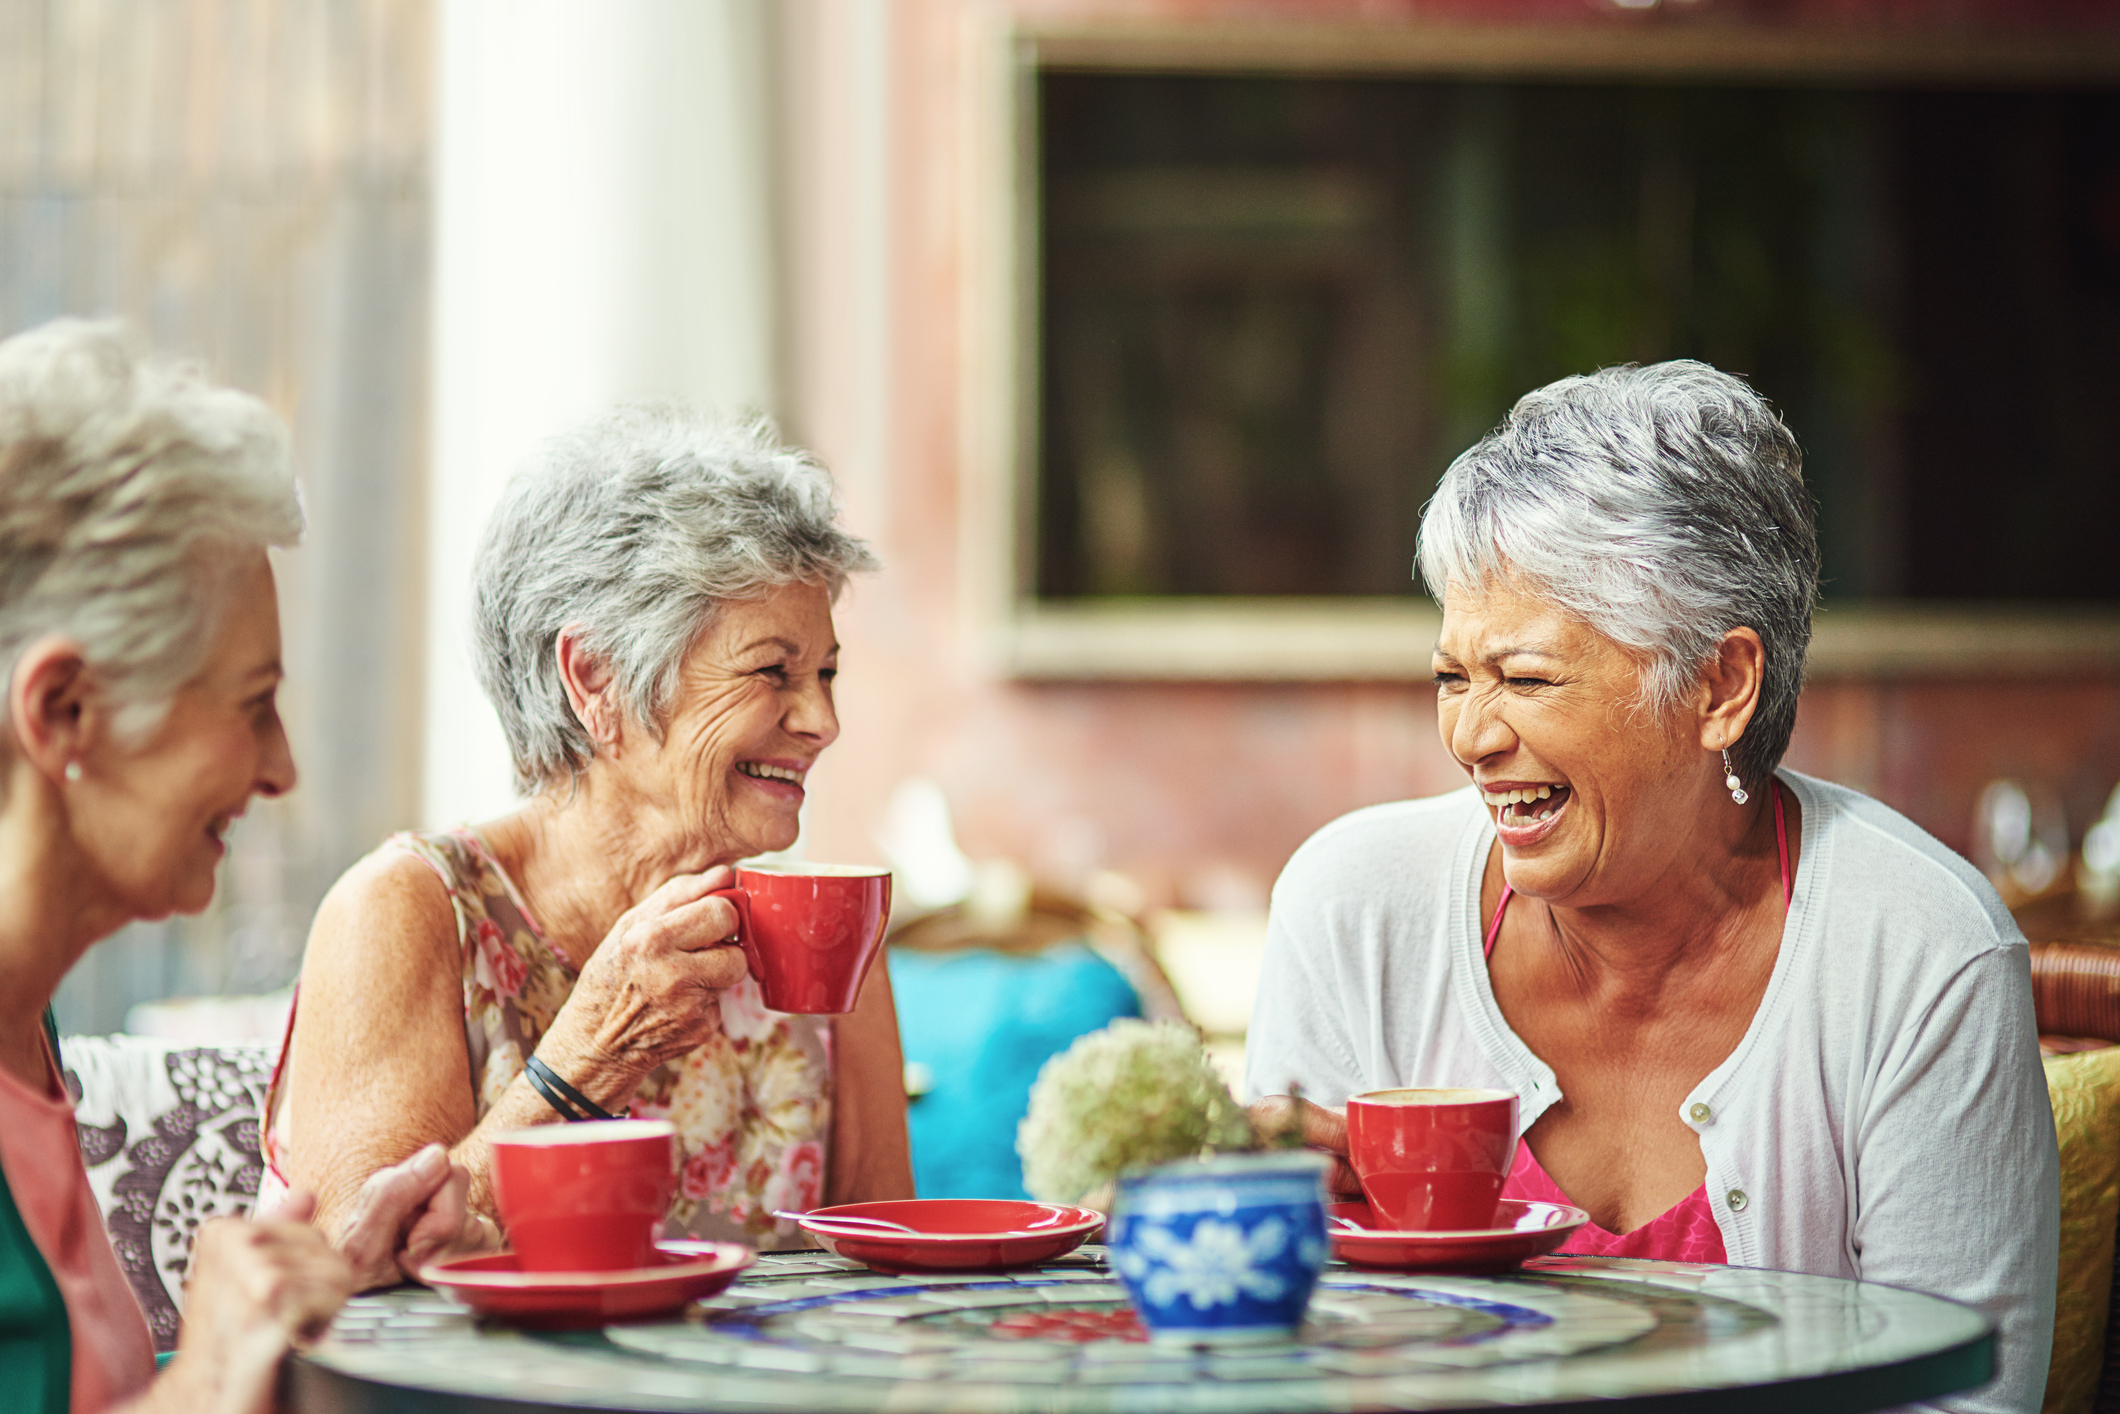 Lifelong-friends-catching-up-over-coffee-529426058_2122x1416.jpeg